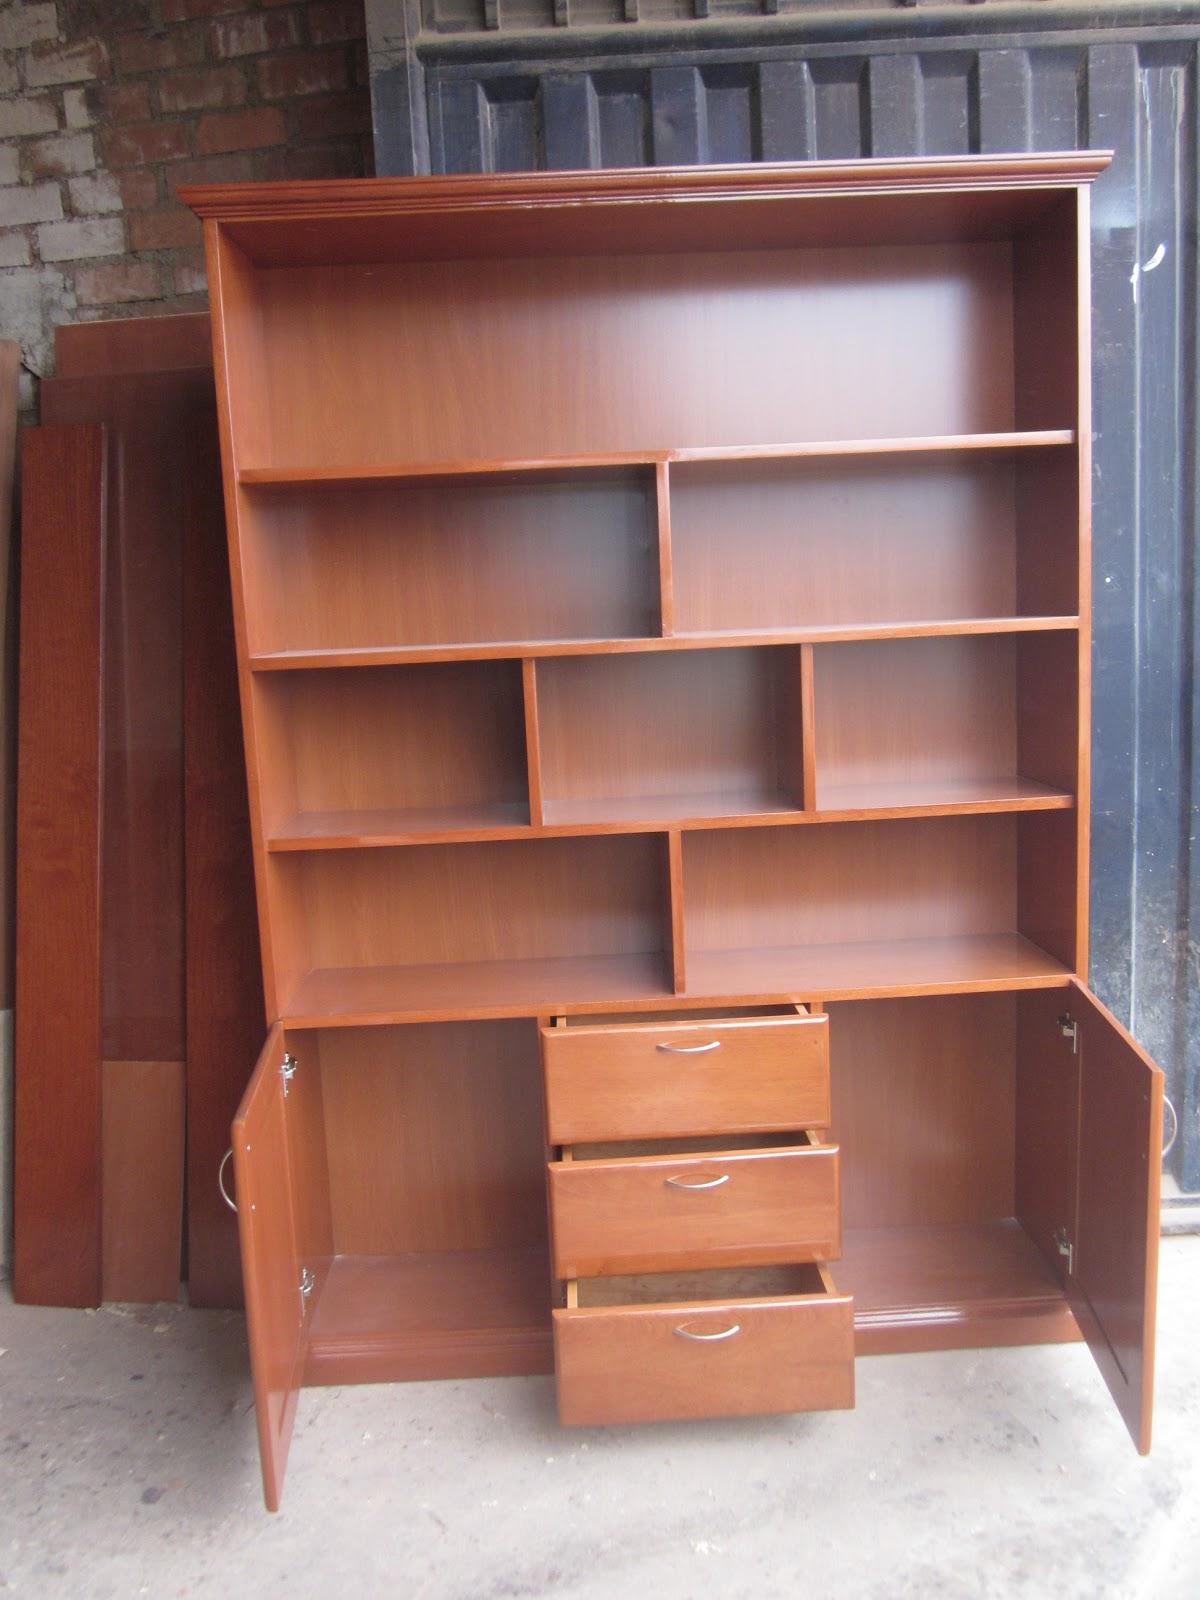 Ferredrywall muebles de melamine capinteria y ebanisteria - Muebles jose maria ...